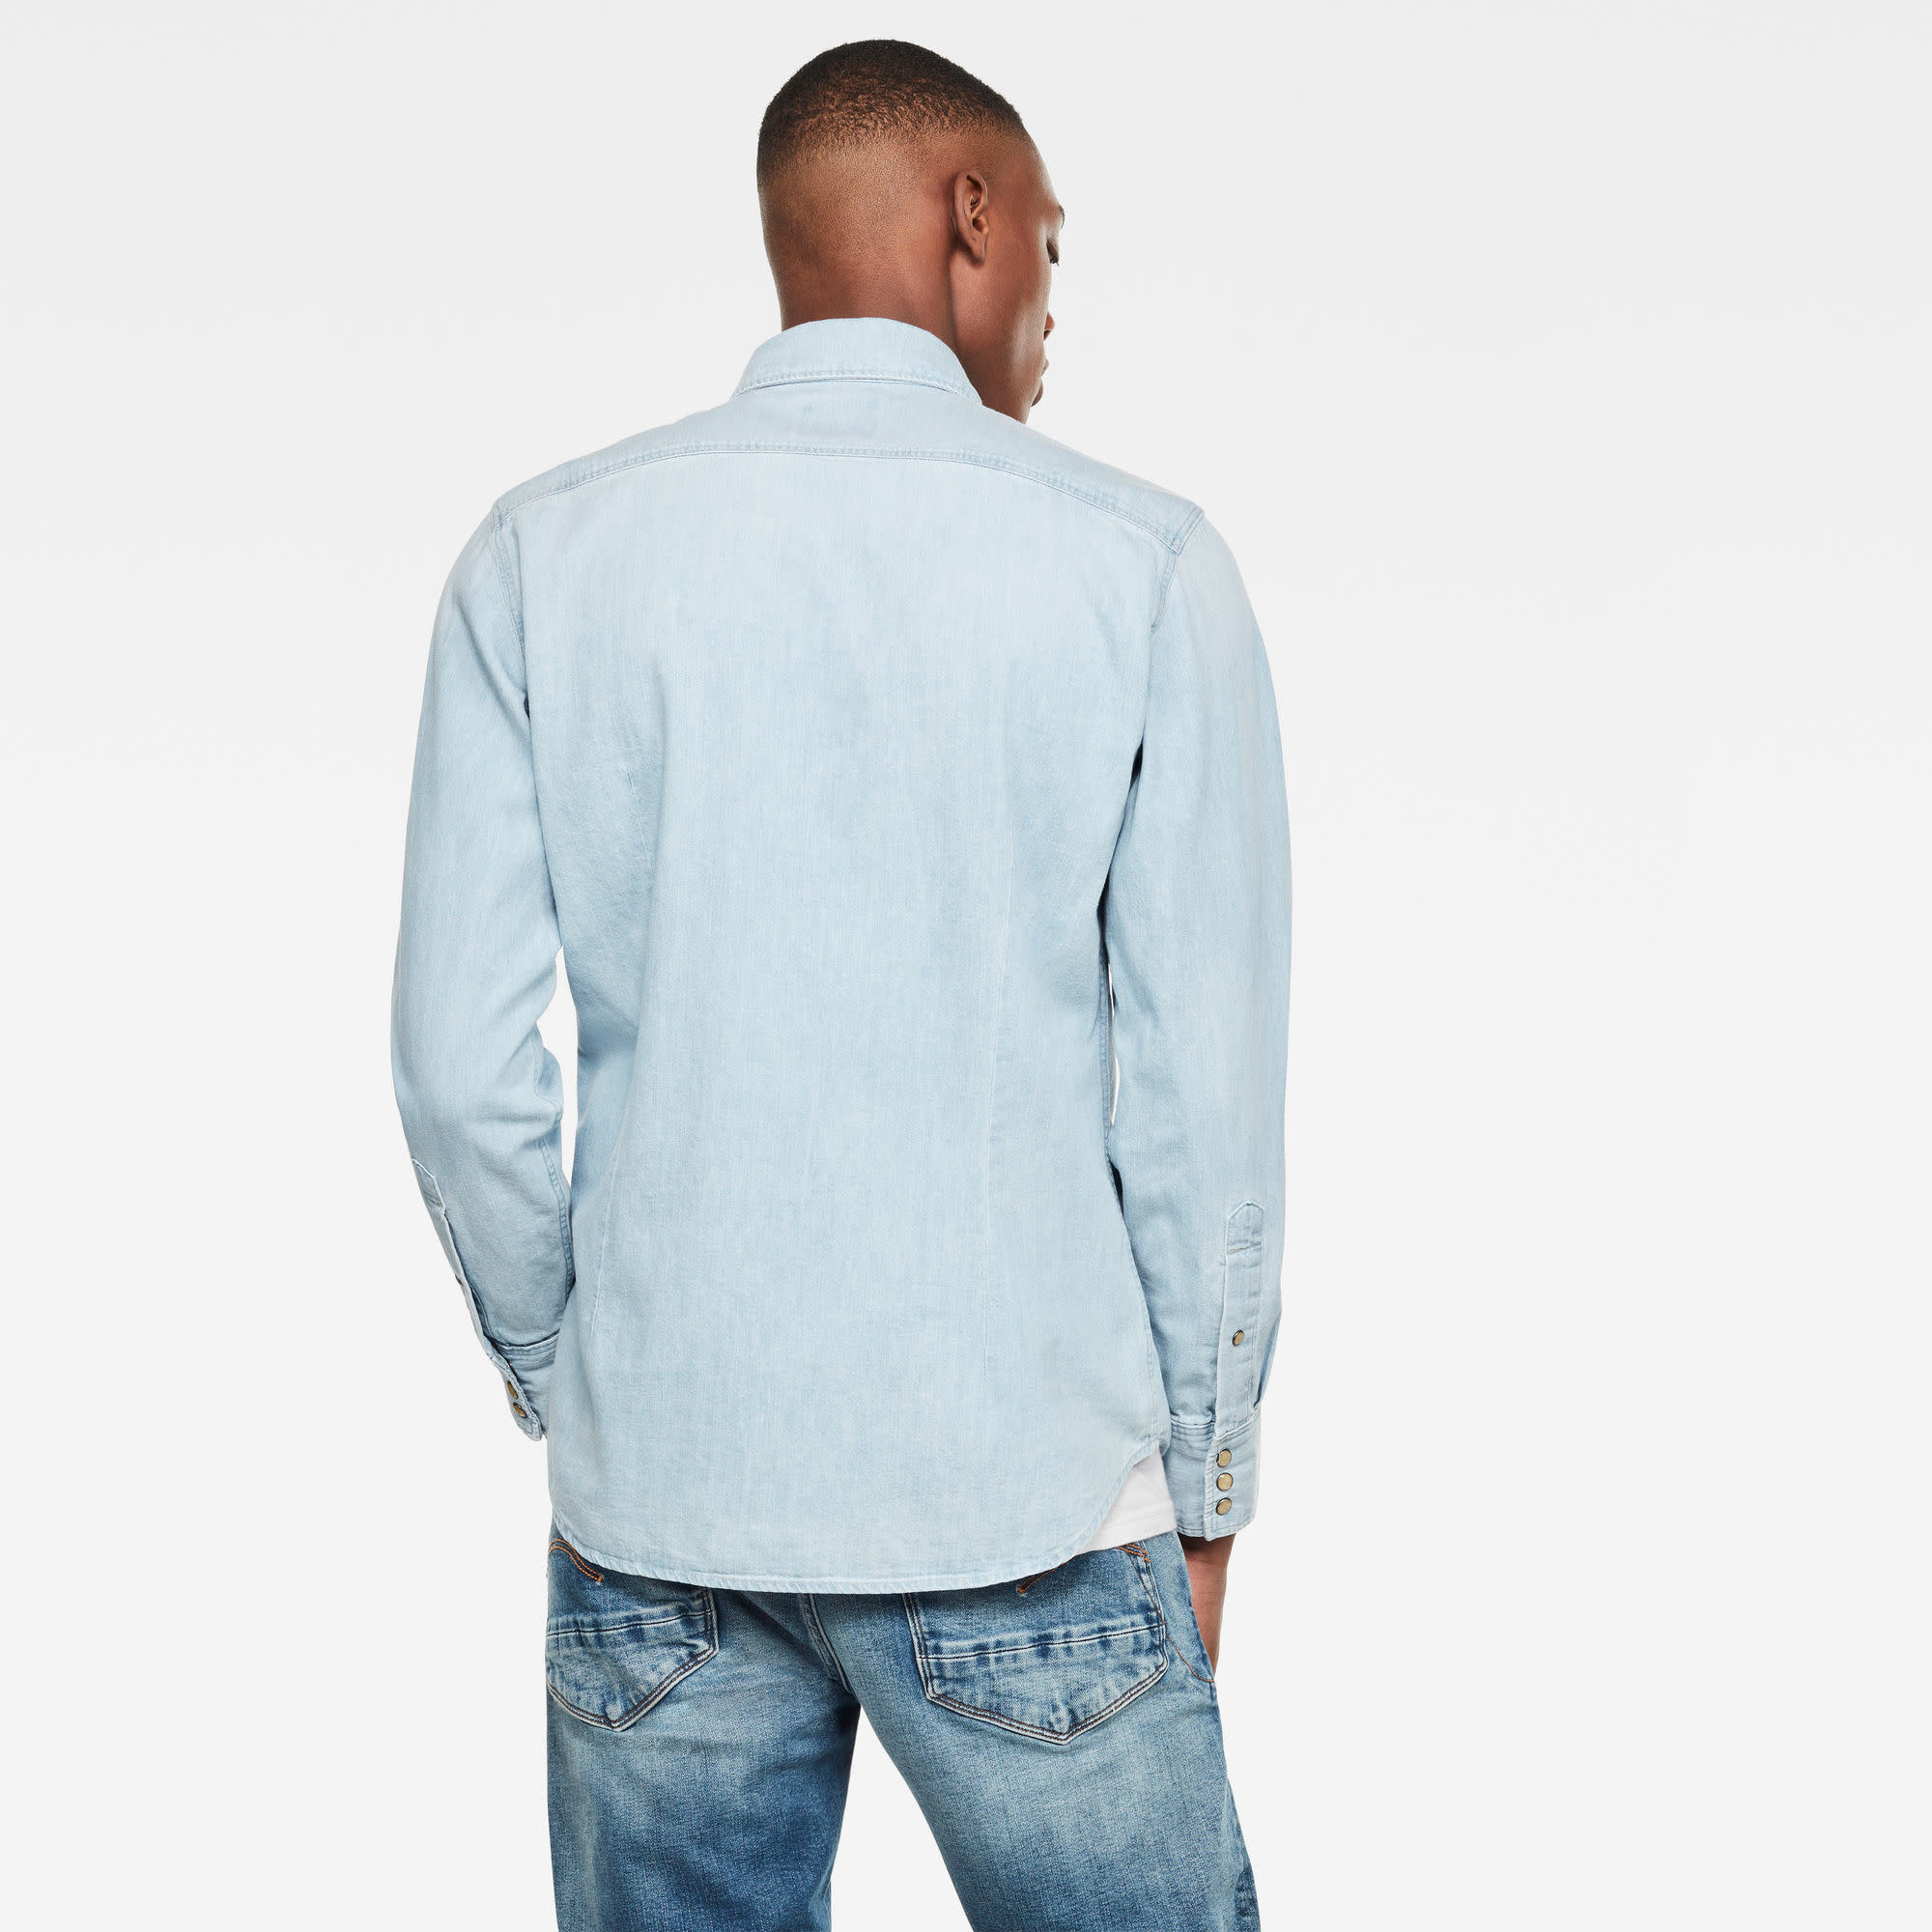 G-Star G-star 3301 Denim Slim Shirt D013-424 Light Aged